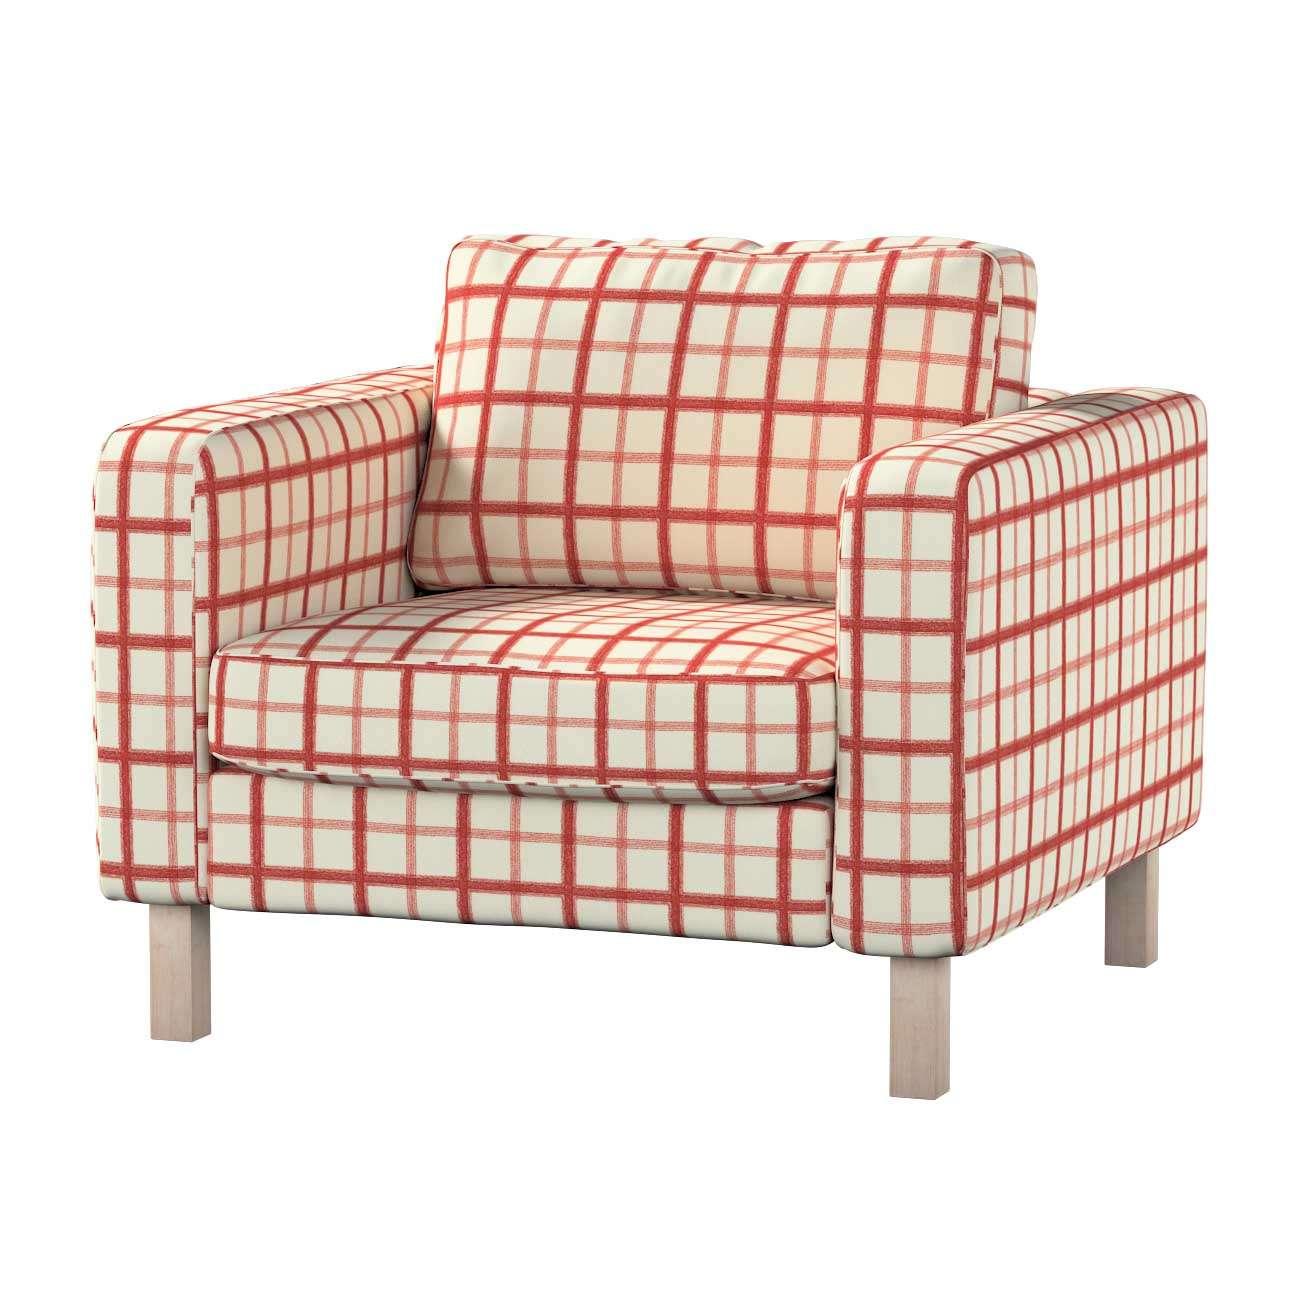 Pokrowiec na fotel Karlstad, krótki Fotel Karlstad w kolekcji Avinon, tkanina: 131-15